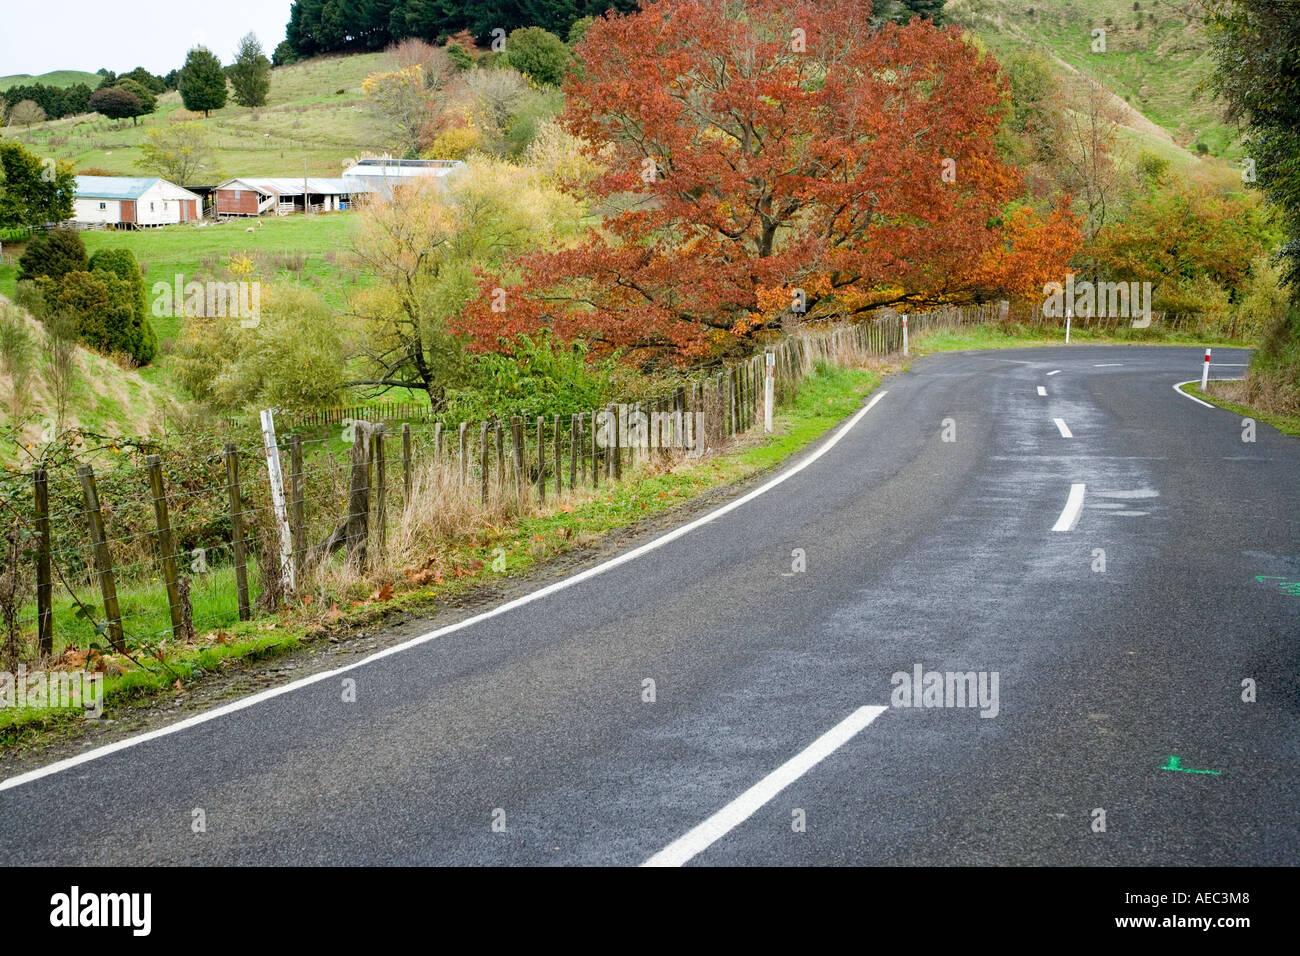 Forgotten World Highway Taumarunui Stratford King Country North Island New Zealand - Stock Image